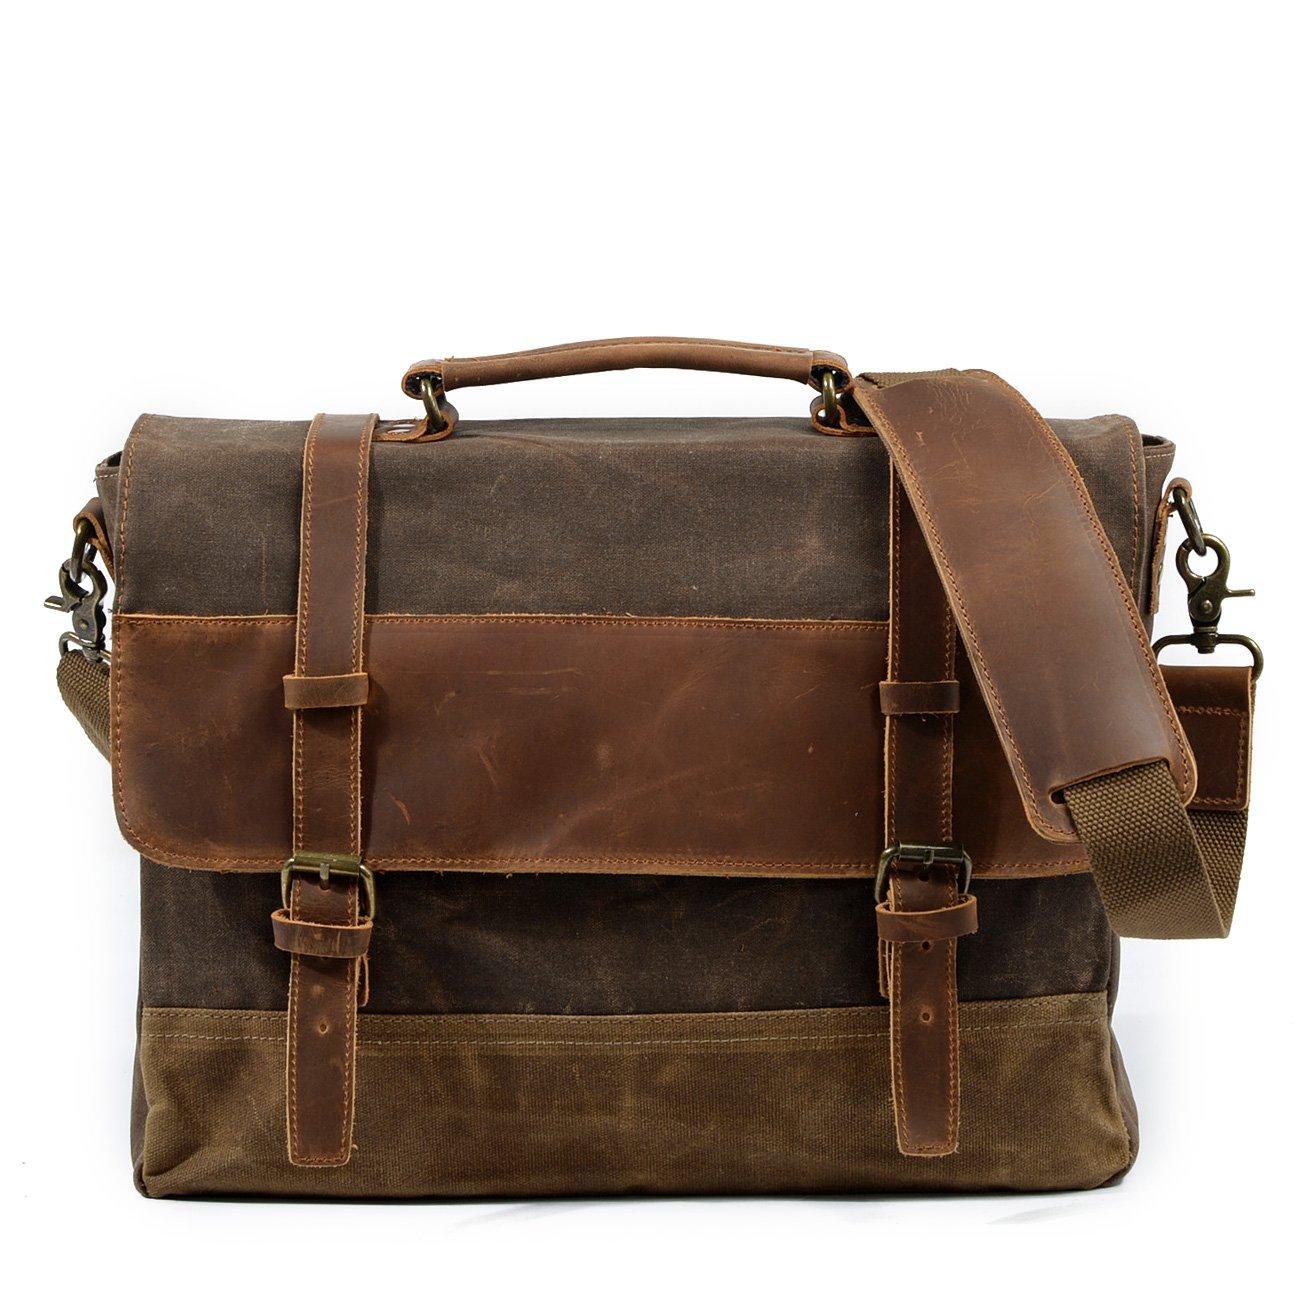 Amazon.com  Mens Vintage Retro Genuine Leather Messenger Bag Waterproof  Canvas Leather Computer Laptop Bag 15 Inch Briefcase Case (Dark Grey)   Computers   ... 5e85ca4c1f09e